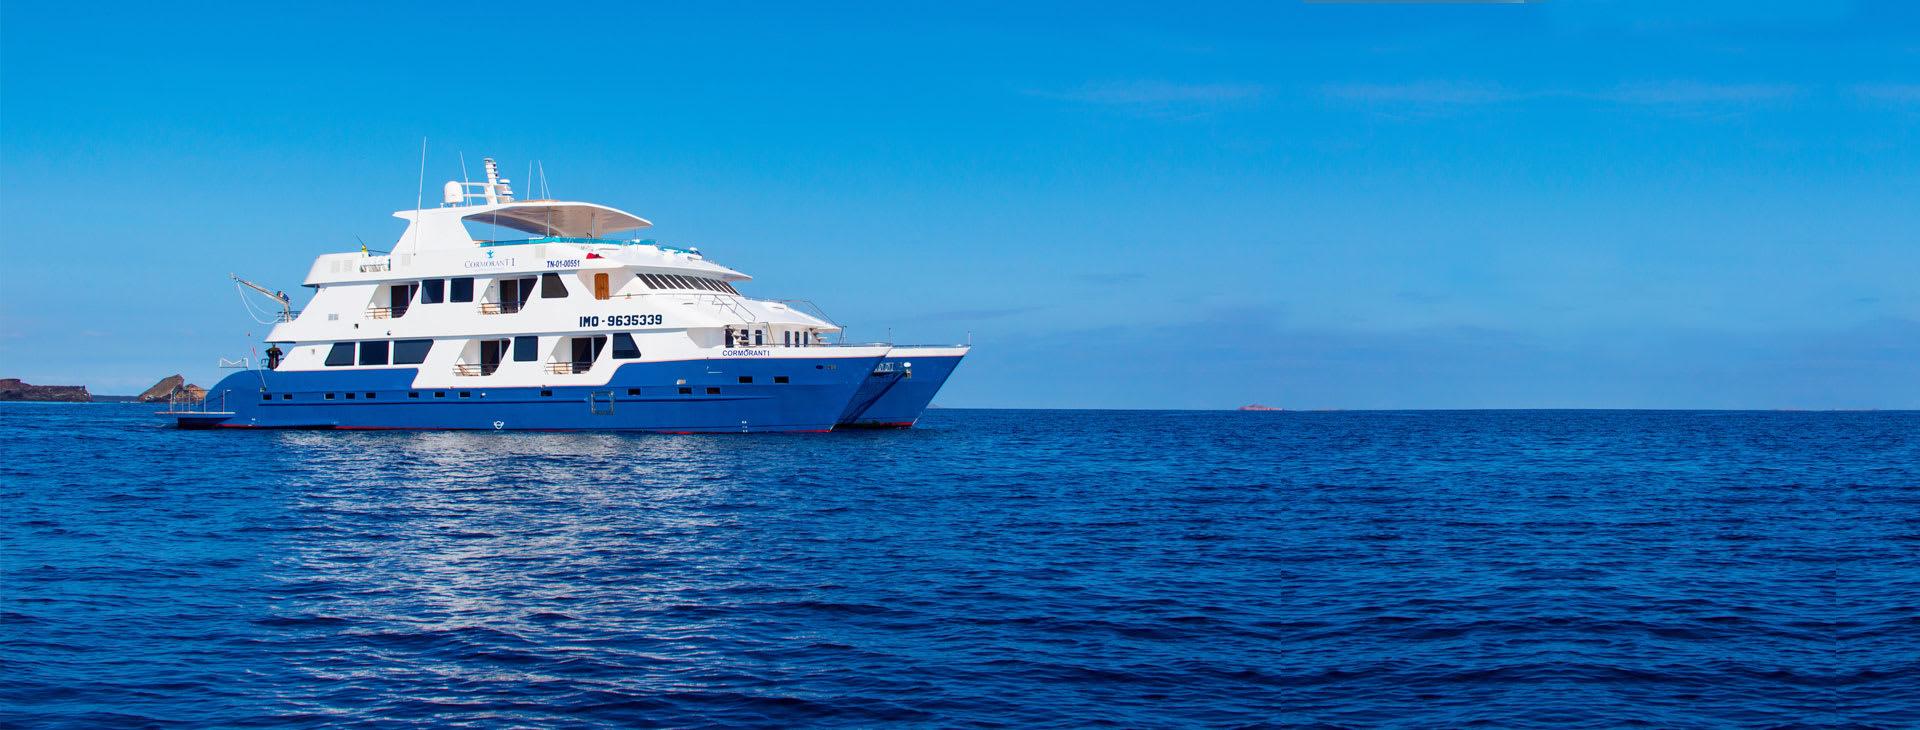 Cormorant Cruise ship at sea